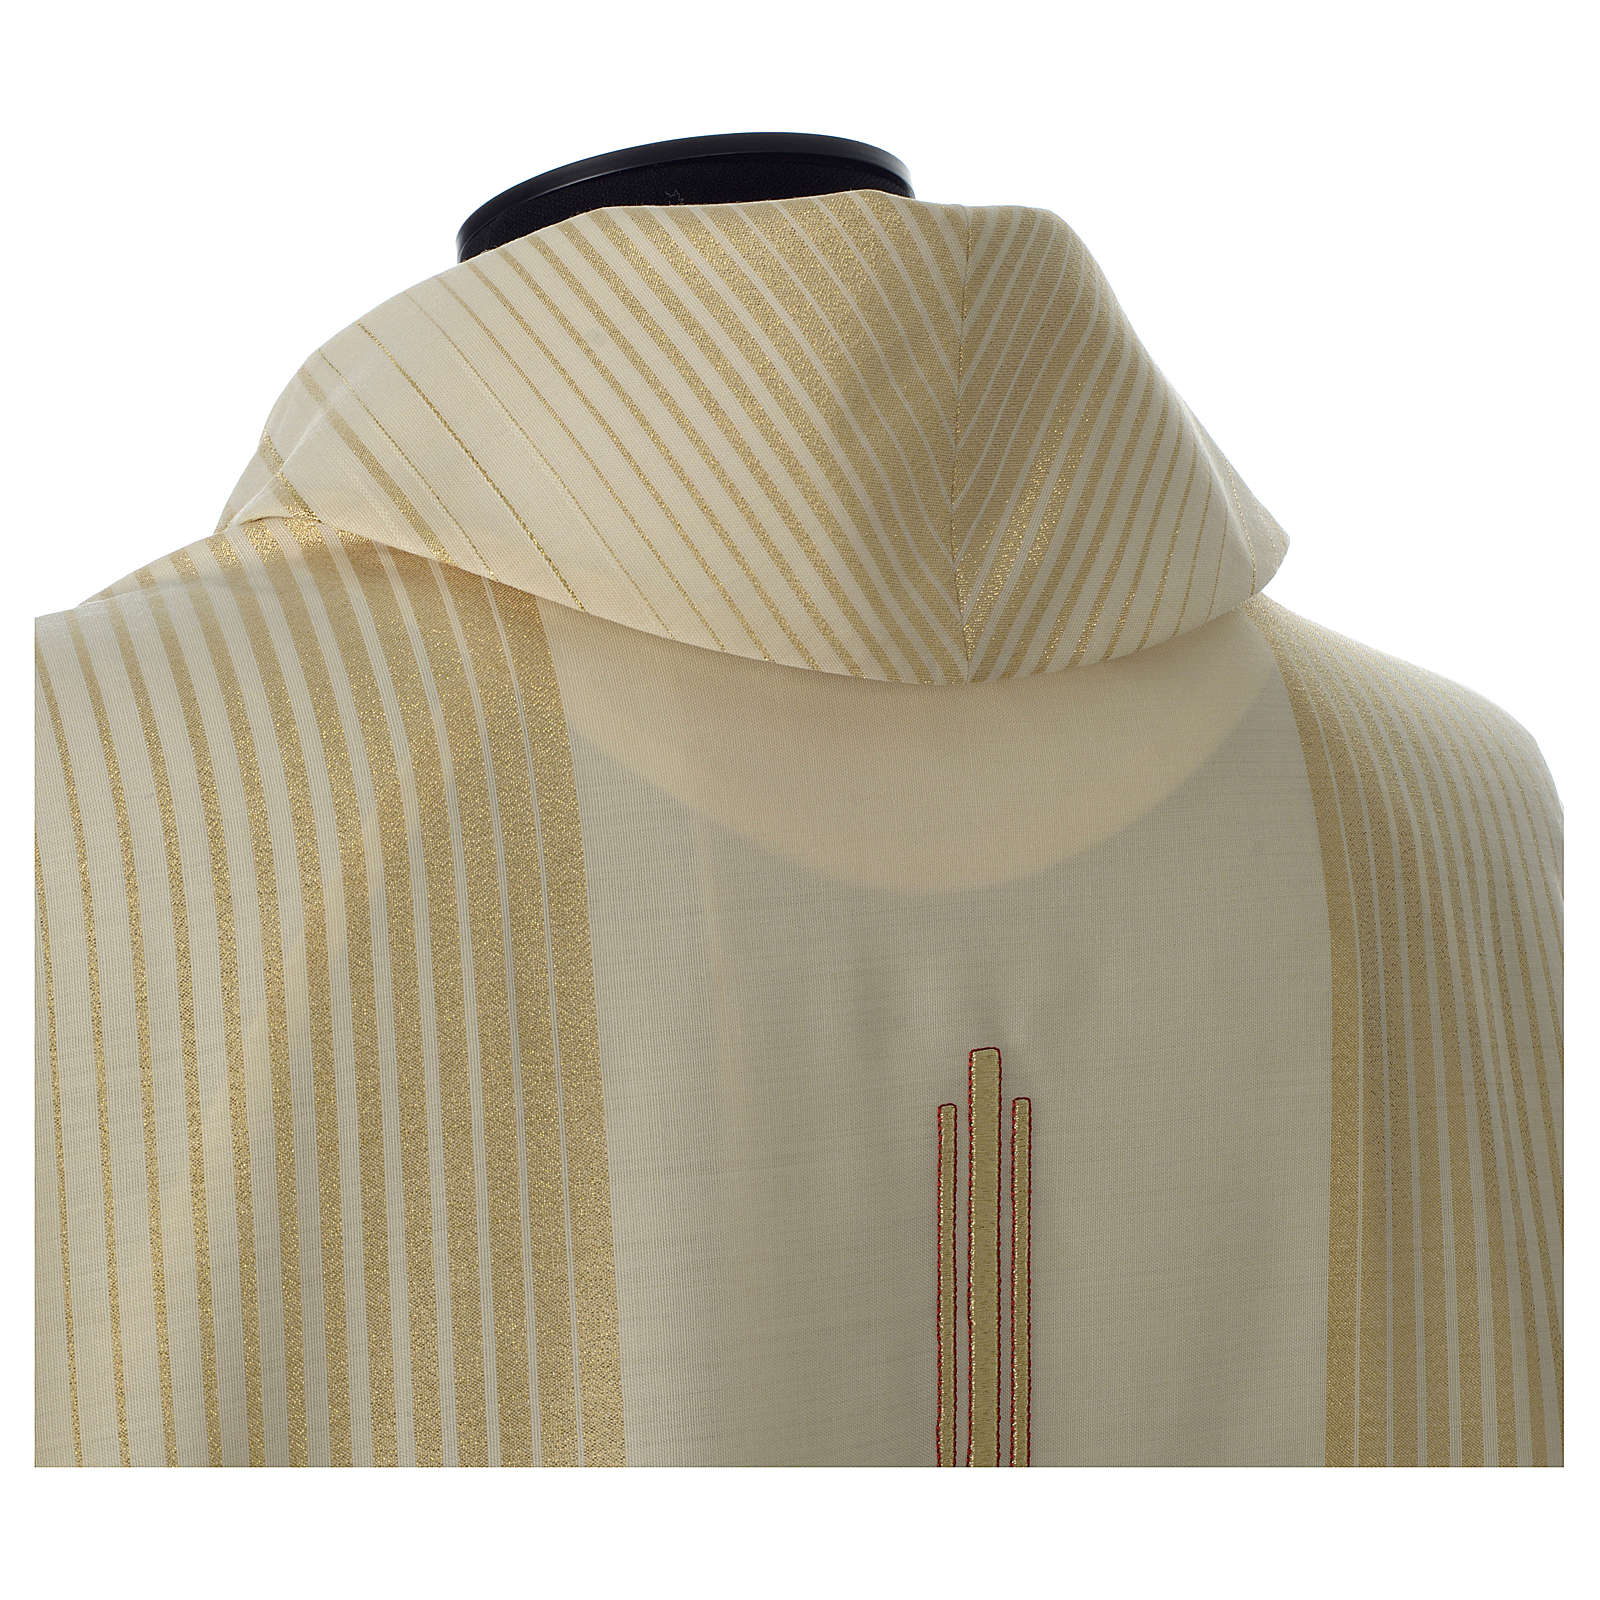 Casula in tessuto rigato lana lurex 4